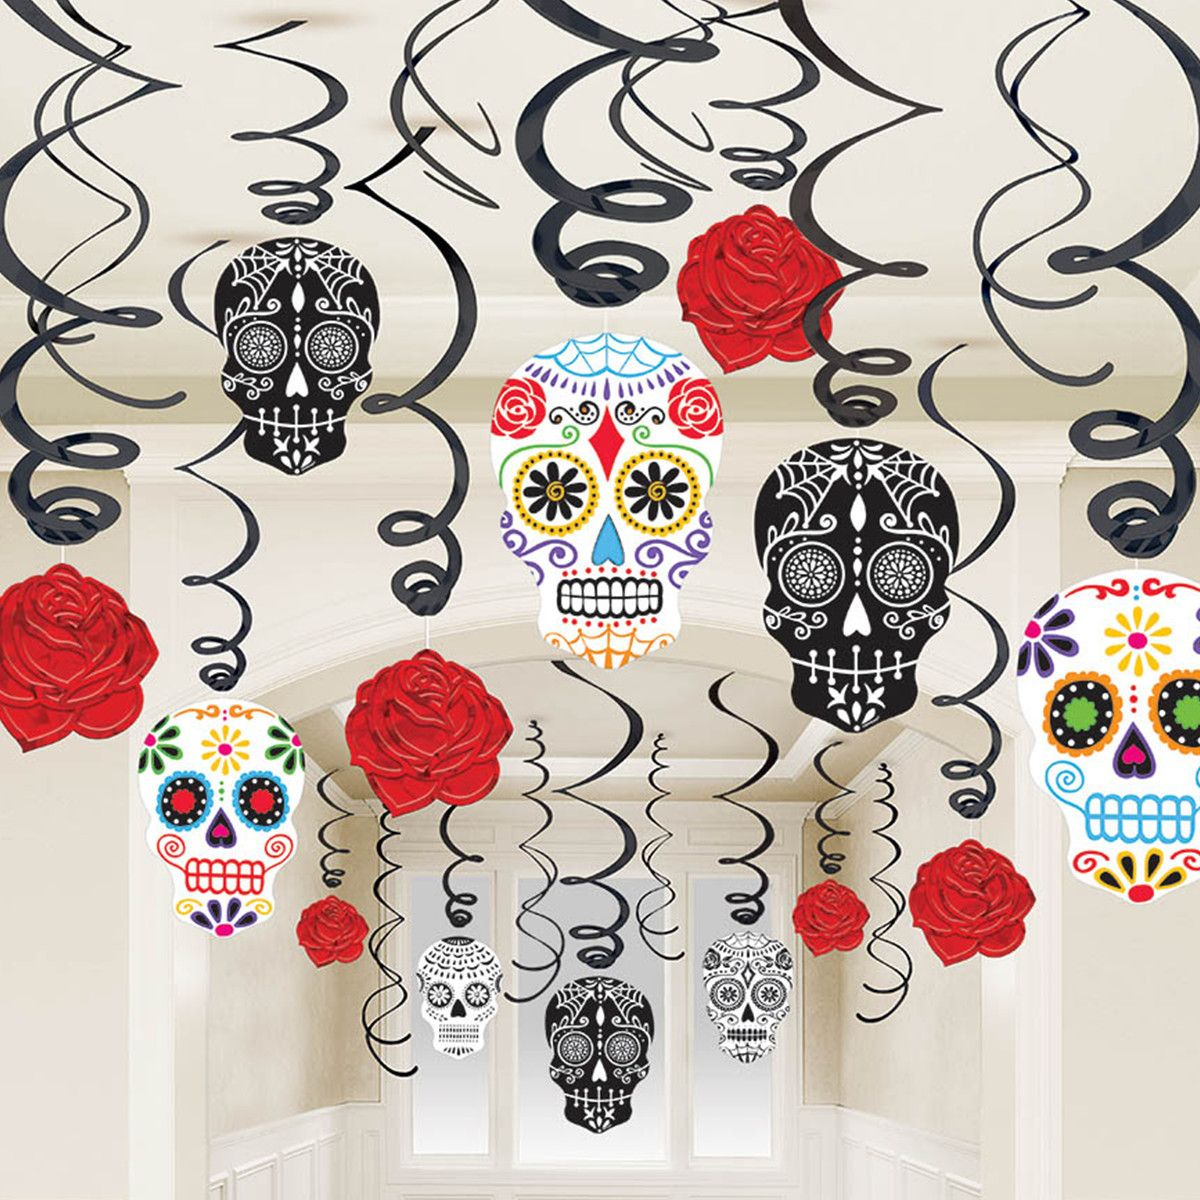 Sugar Skull Party Decorations